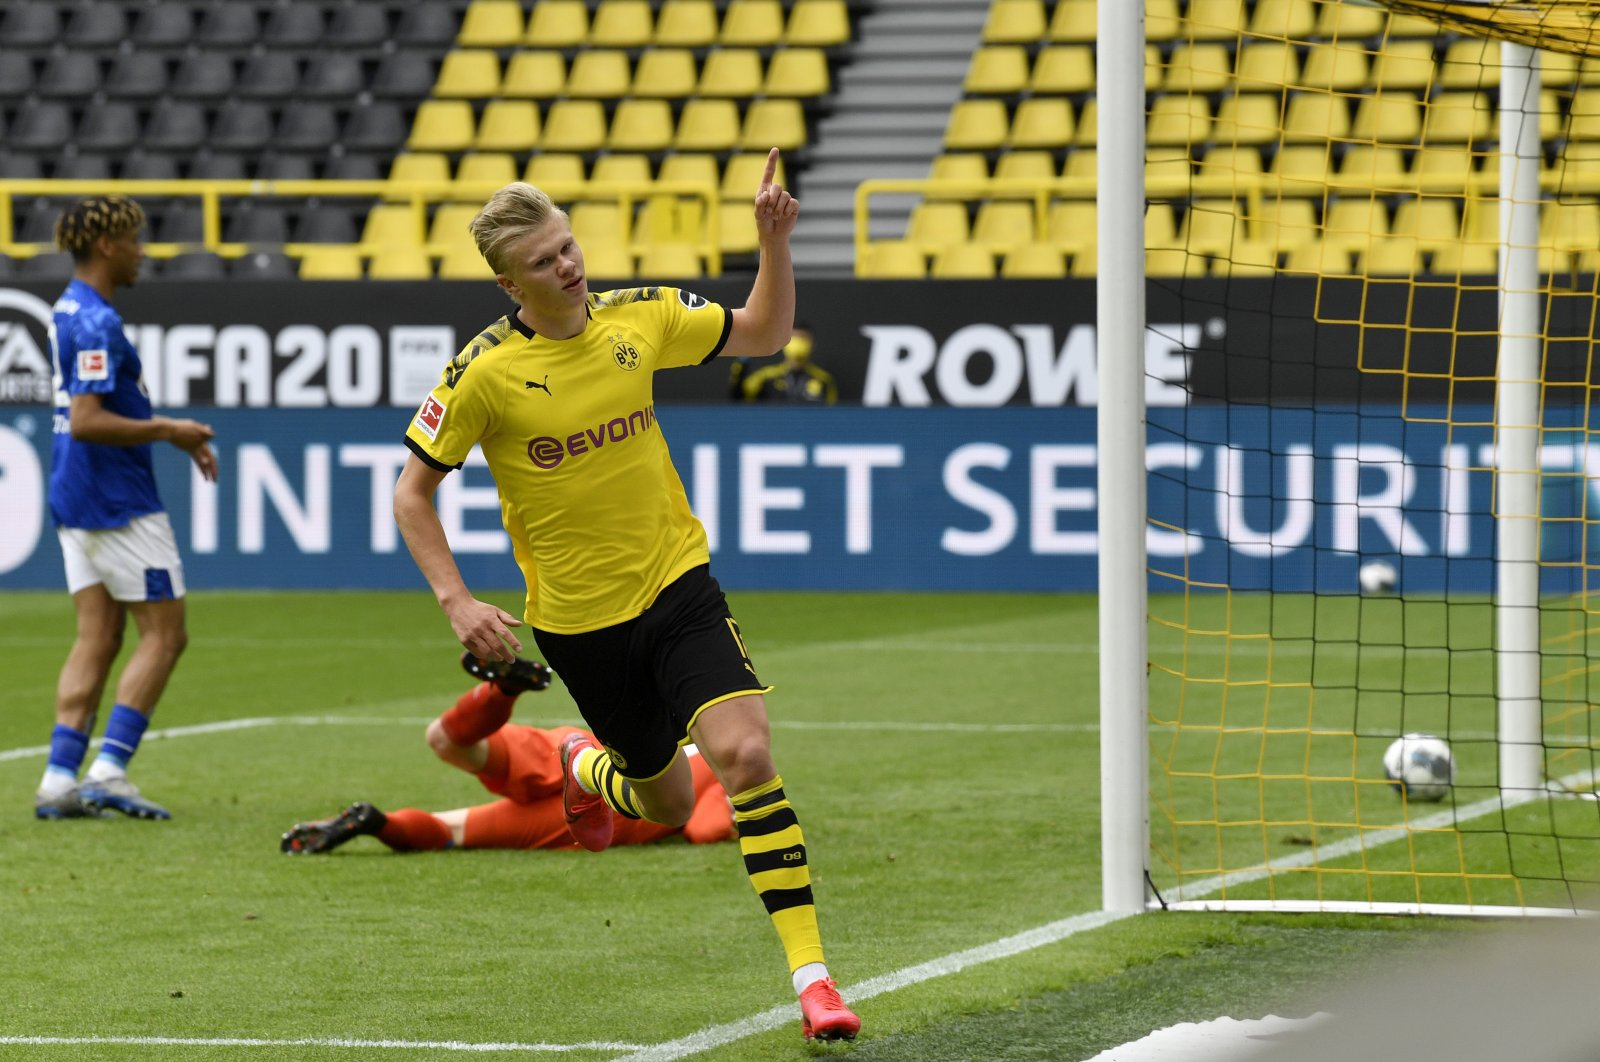 Dortmund's Erling Braut Haaland celebrates after scoring a goal during a Bundesliga match against Schalke 04, Dortmund, Germany, May 16, 2020. (EPA Photo)